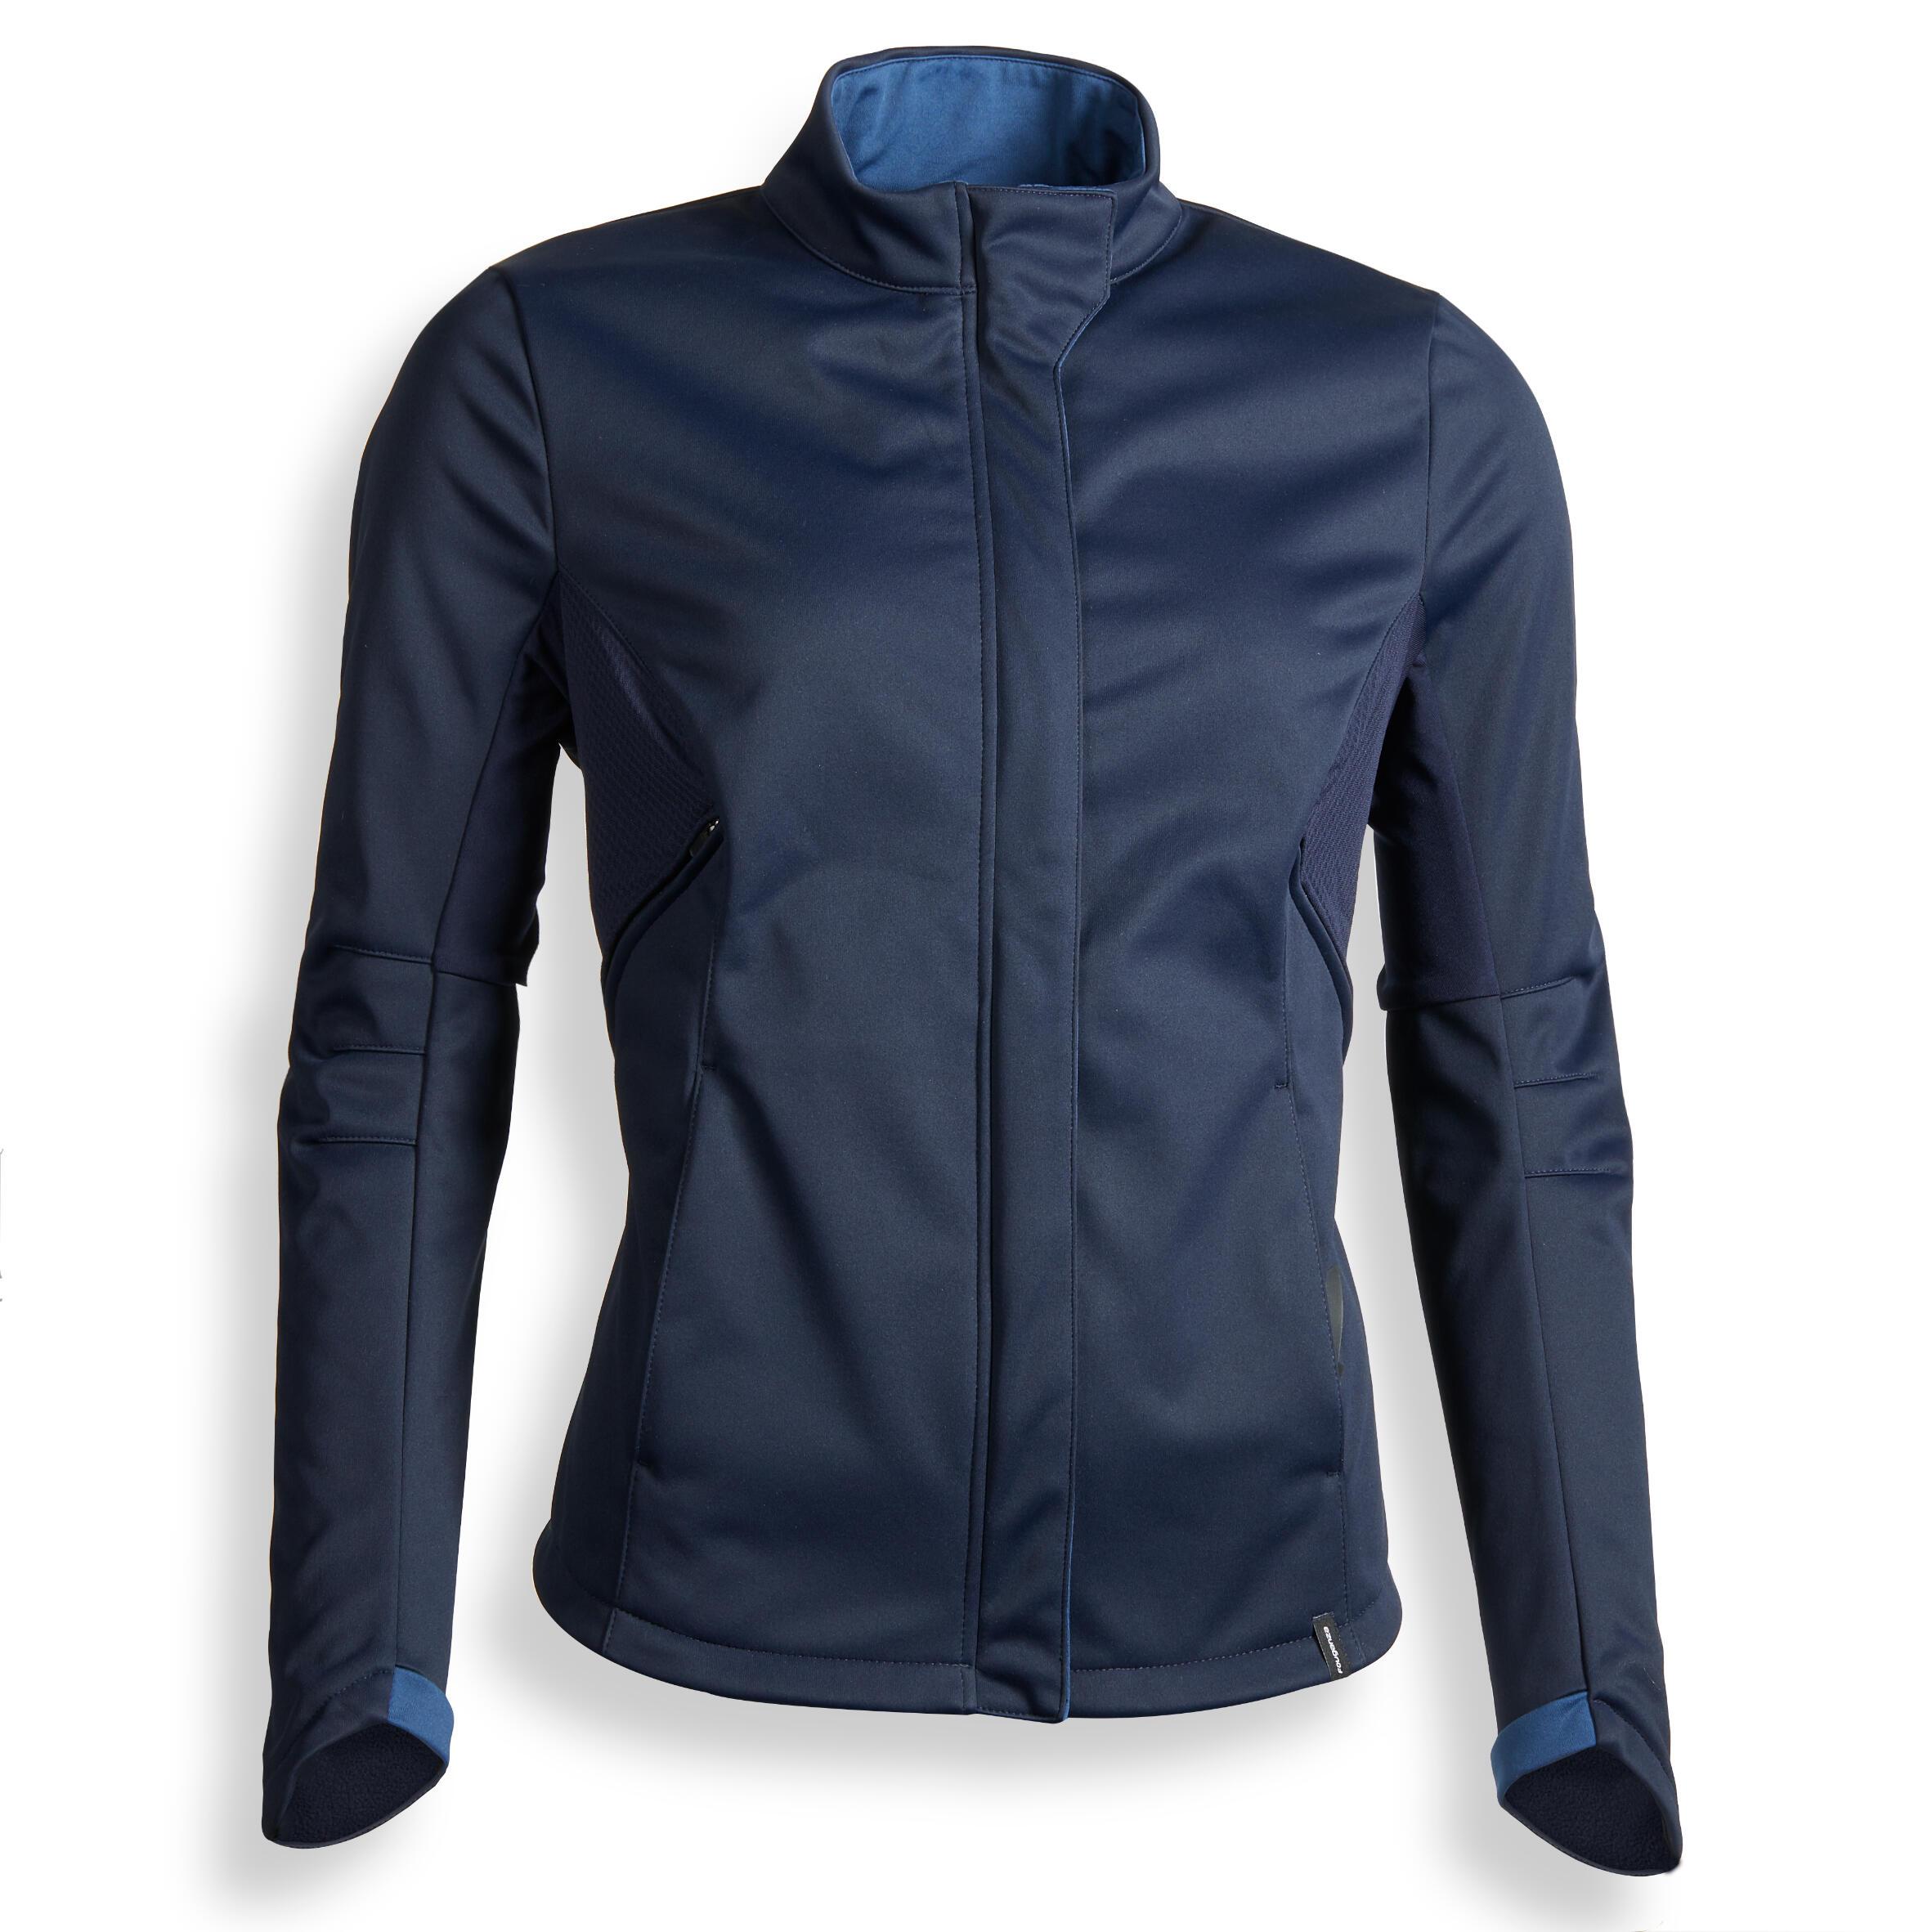 Reitjacke Softshelljacke 500 Damen marineblau | Bekleidung > Jacken | Fouganza